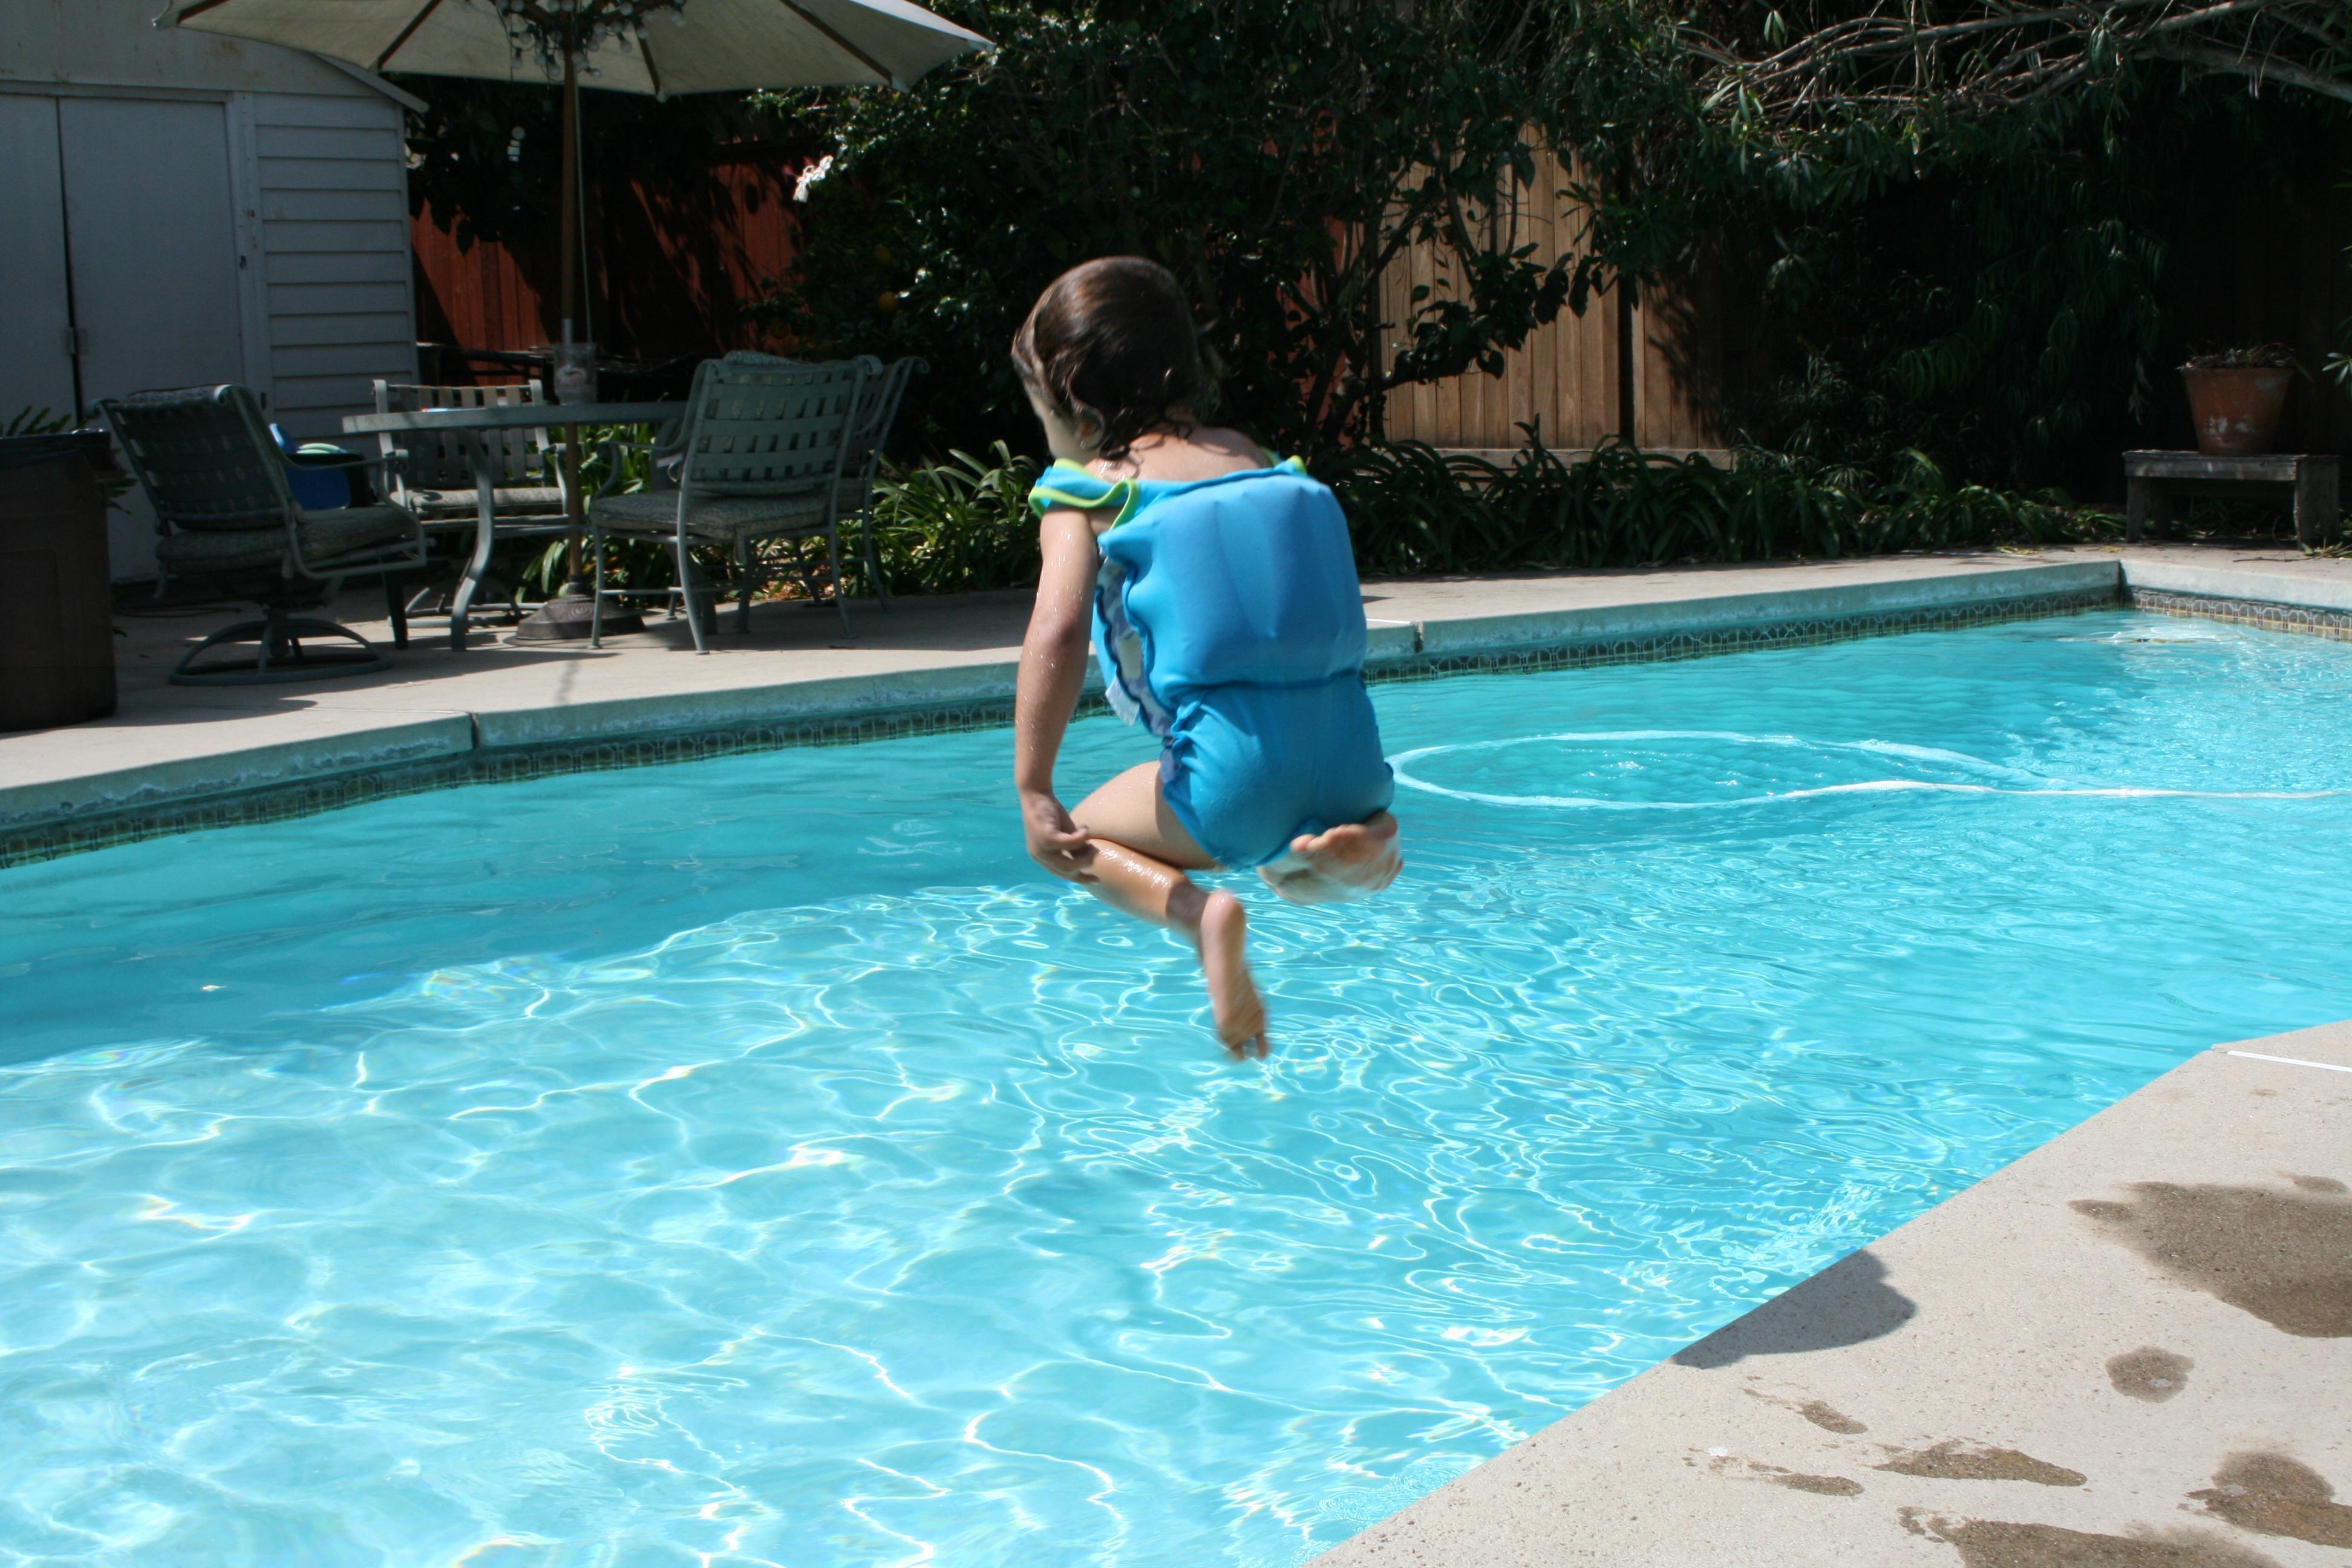 LA Pool Guys image 12